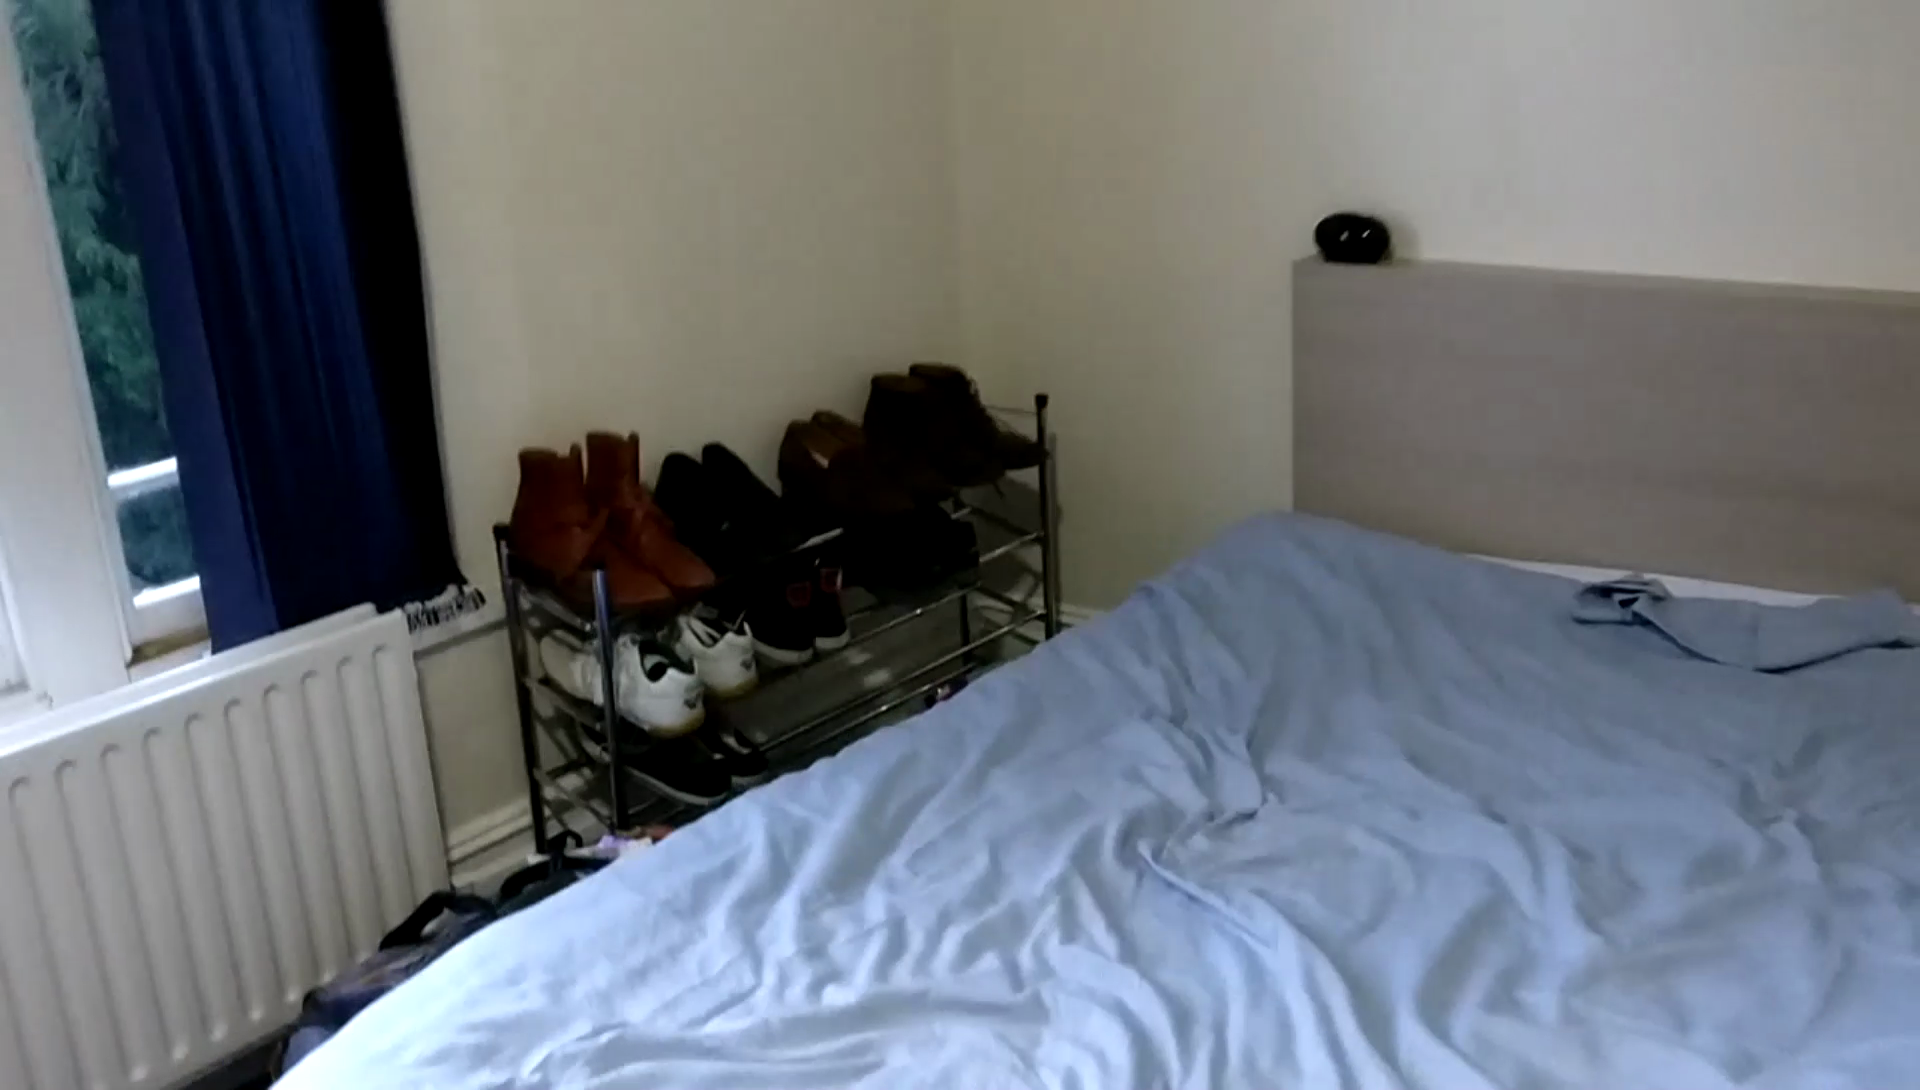 Bed, sans pillow